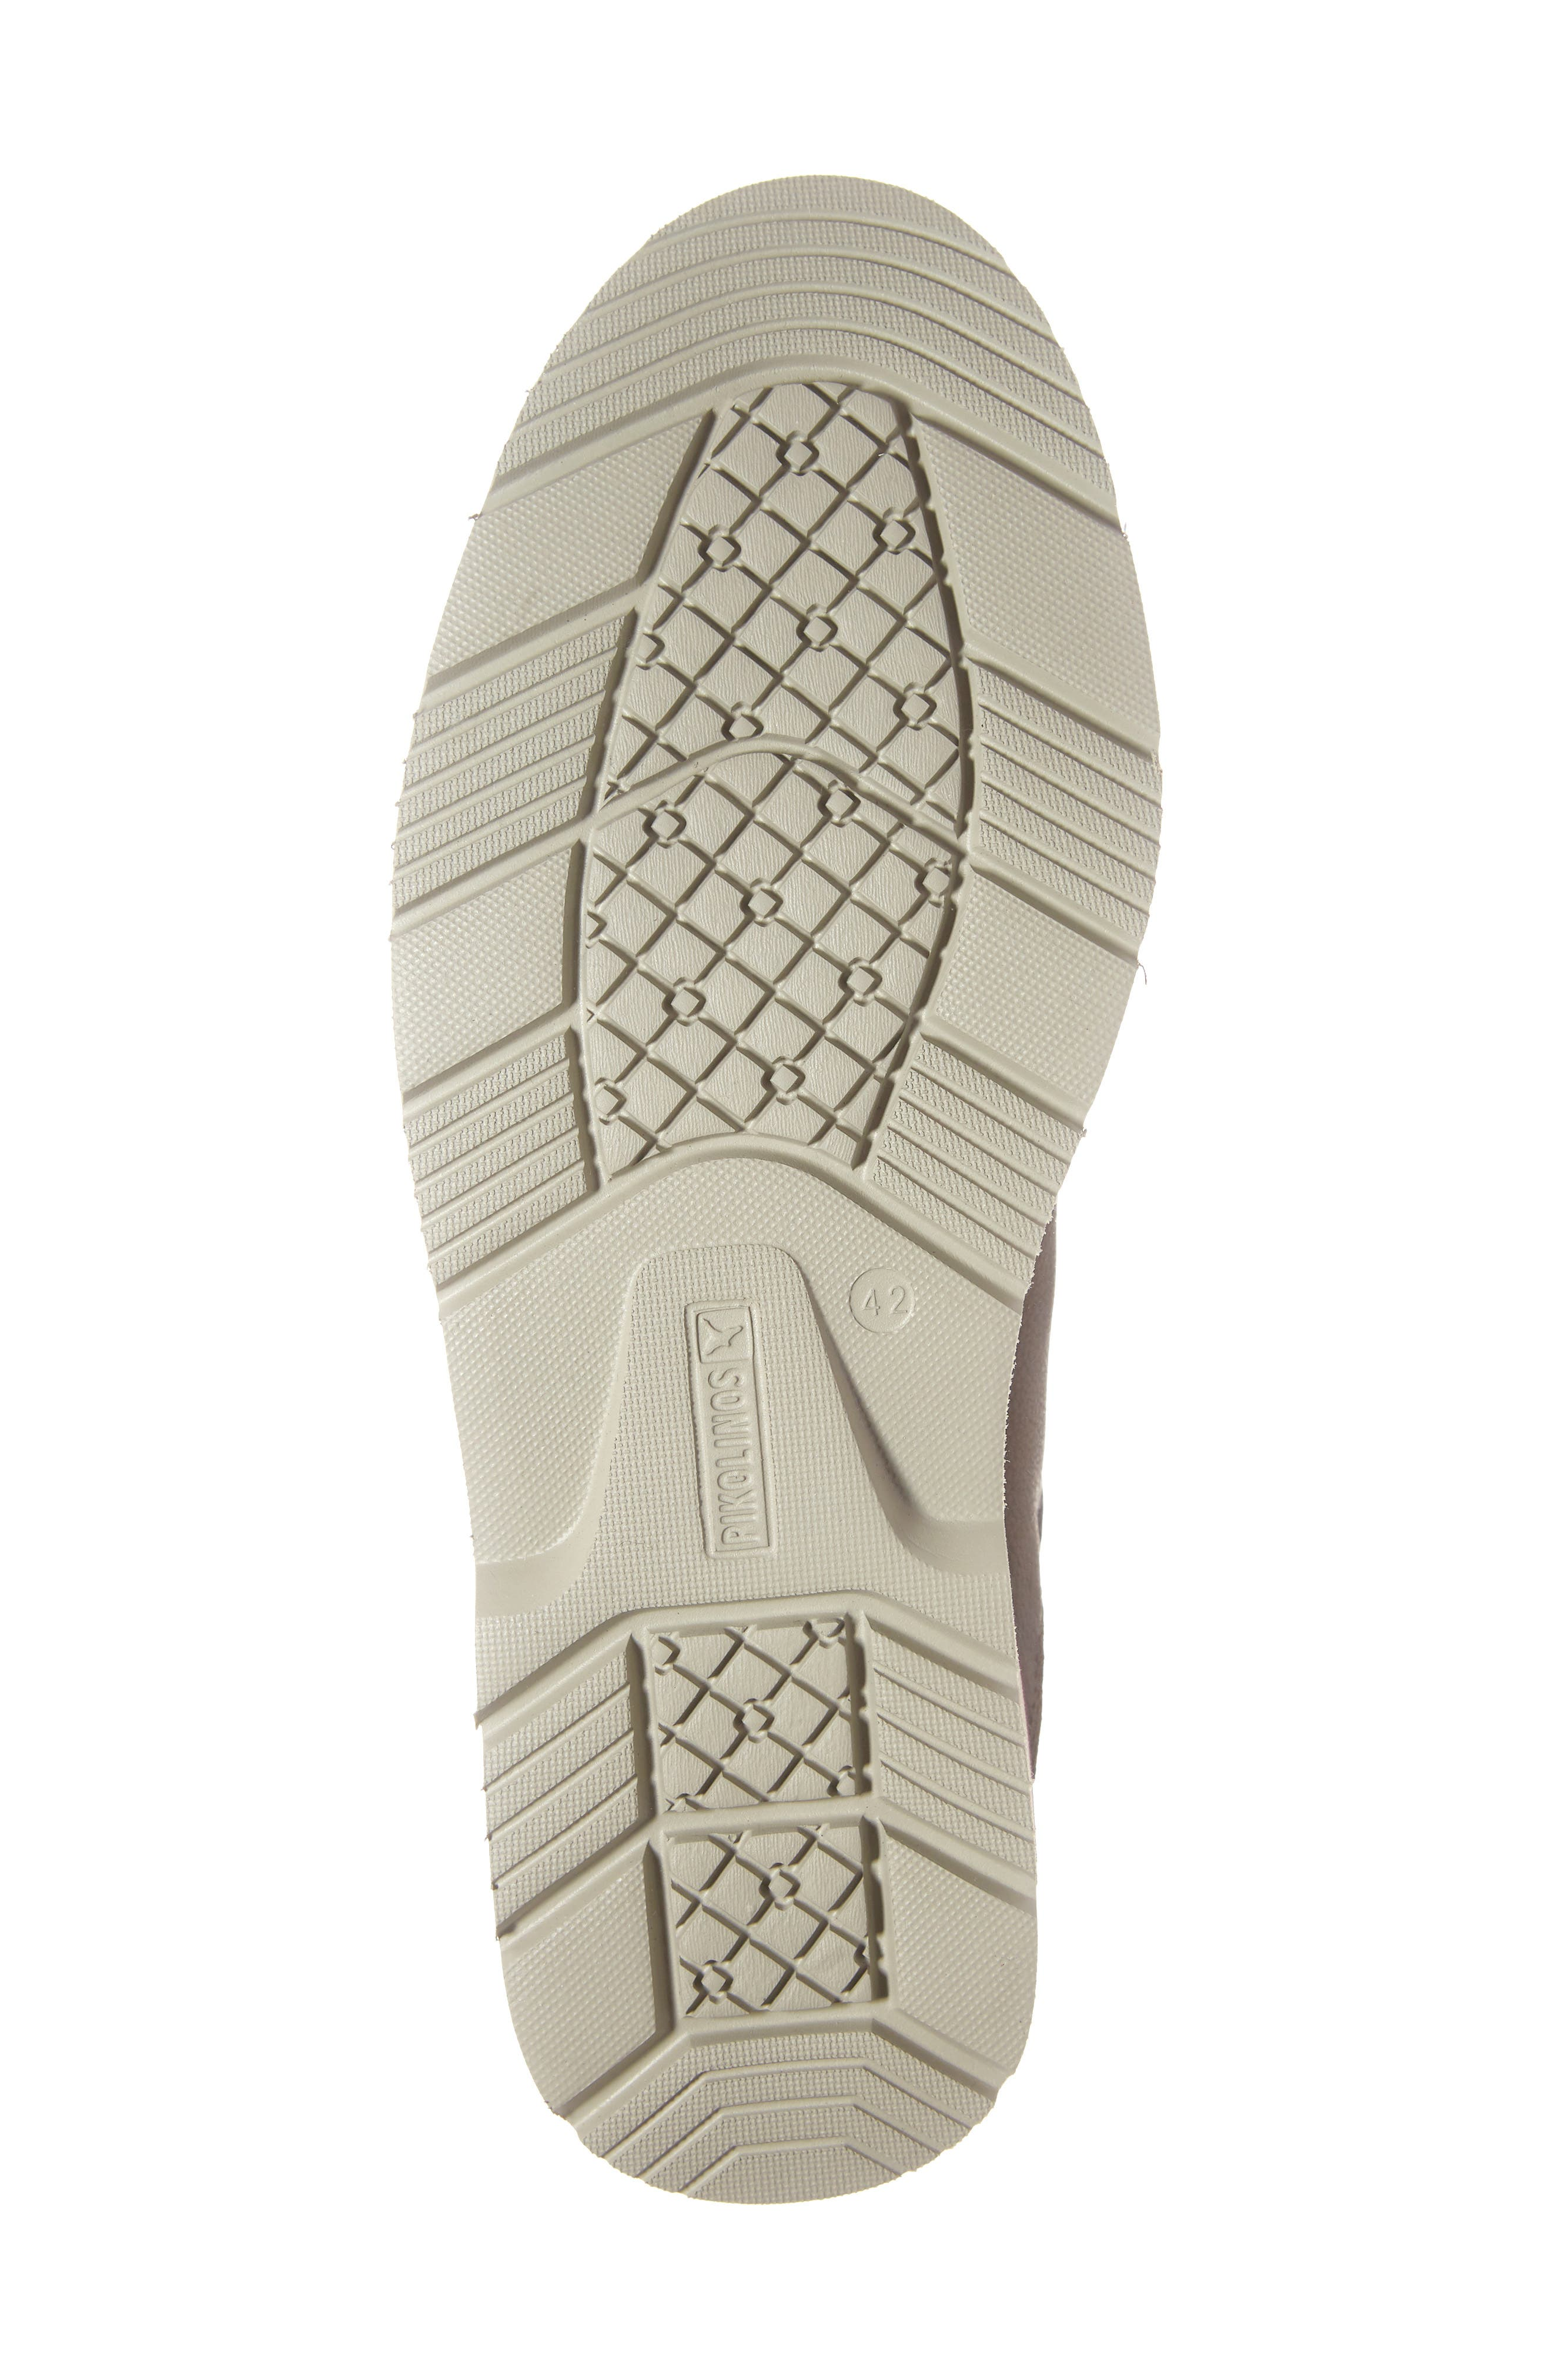 LLeida Plain Toe Boot,                             Alternate thumbnail 6, color,                             617